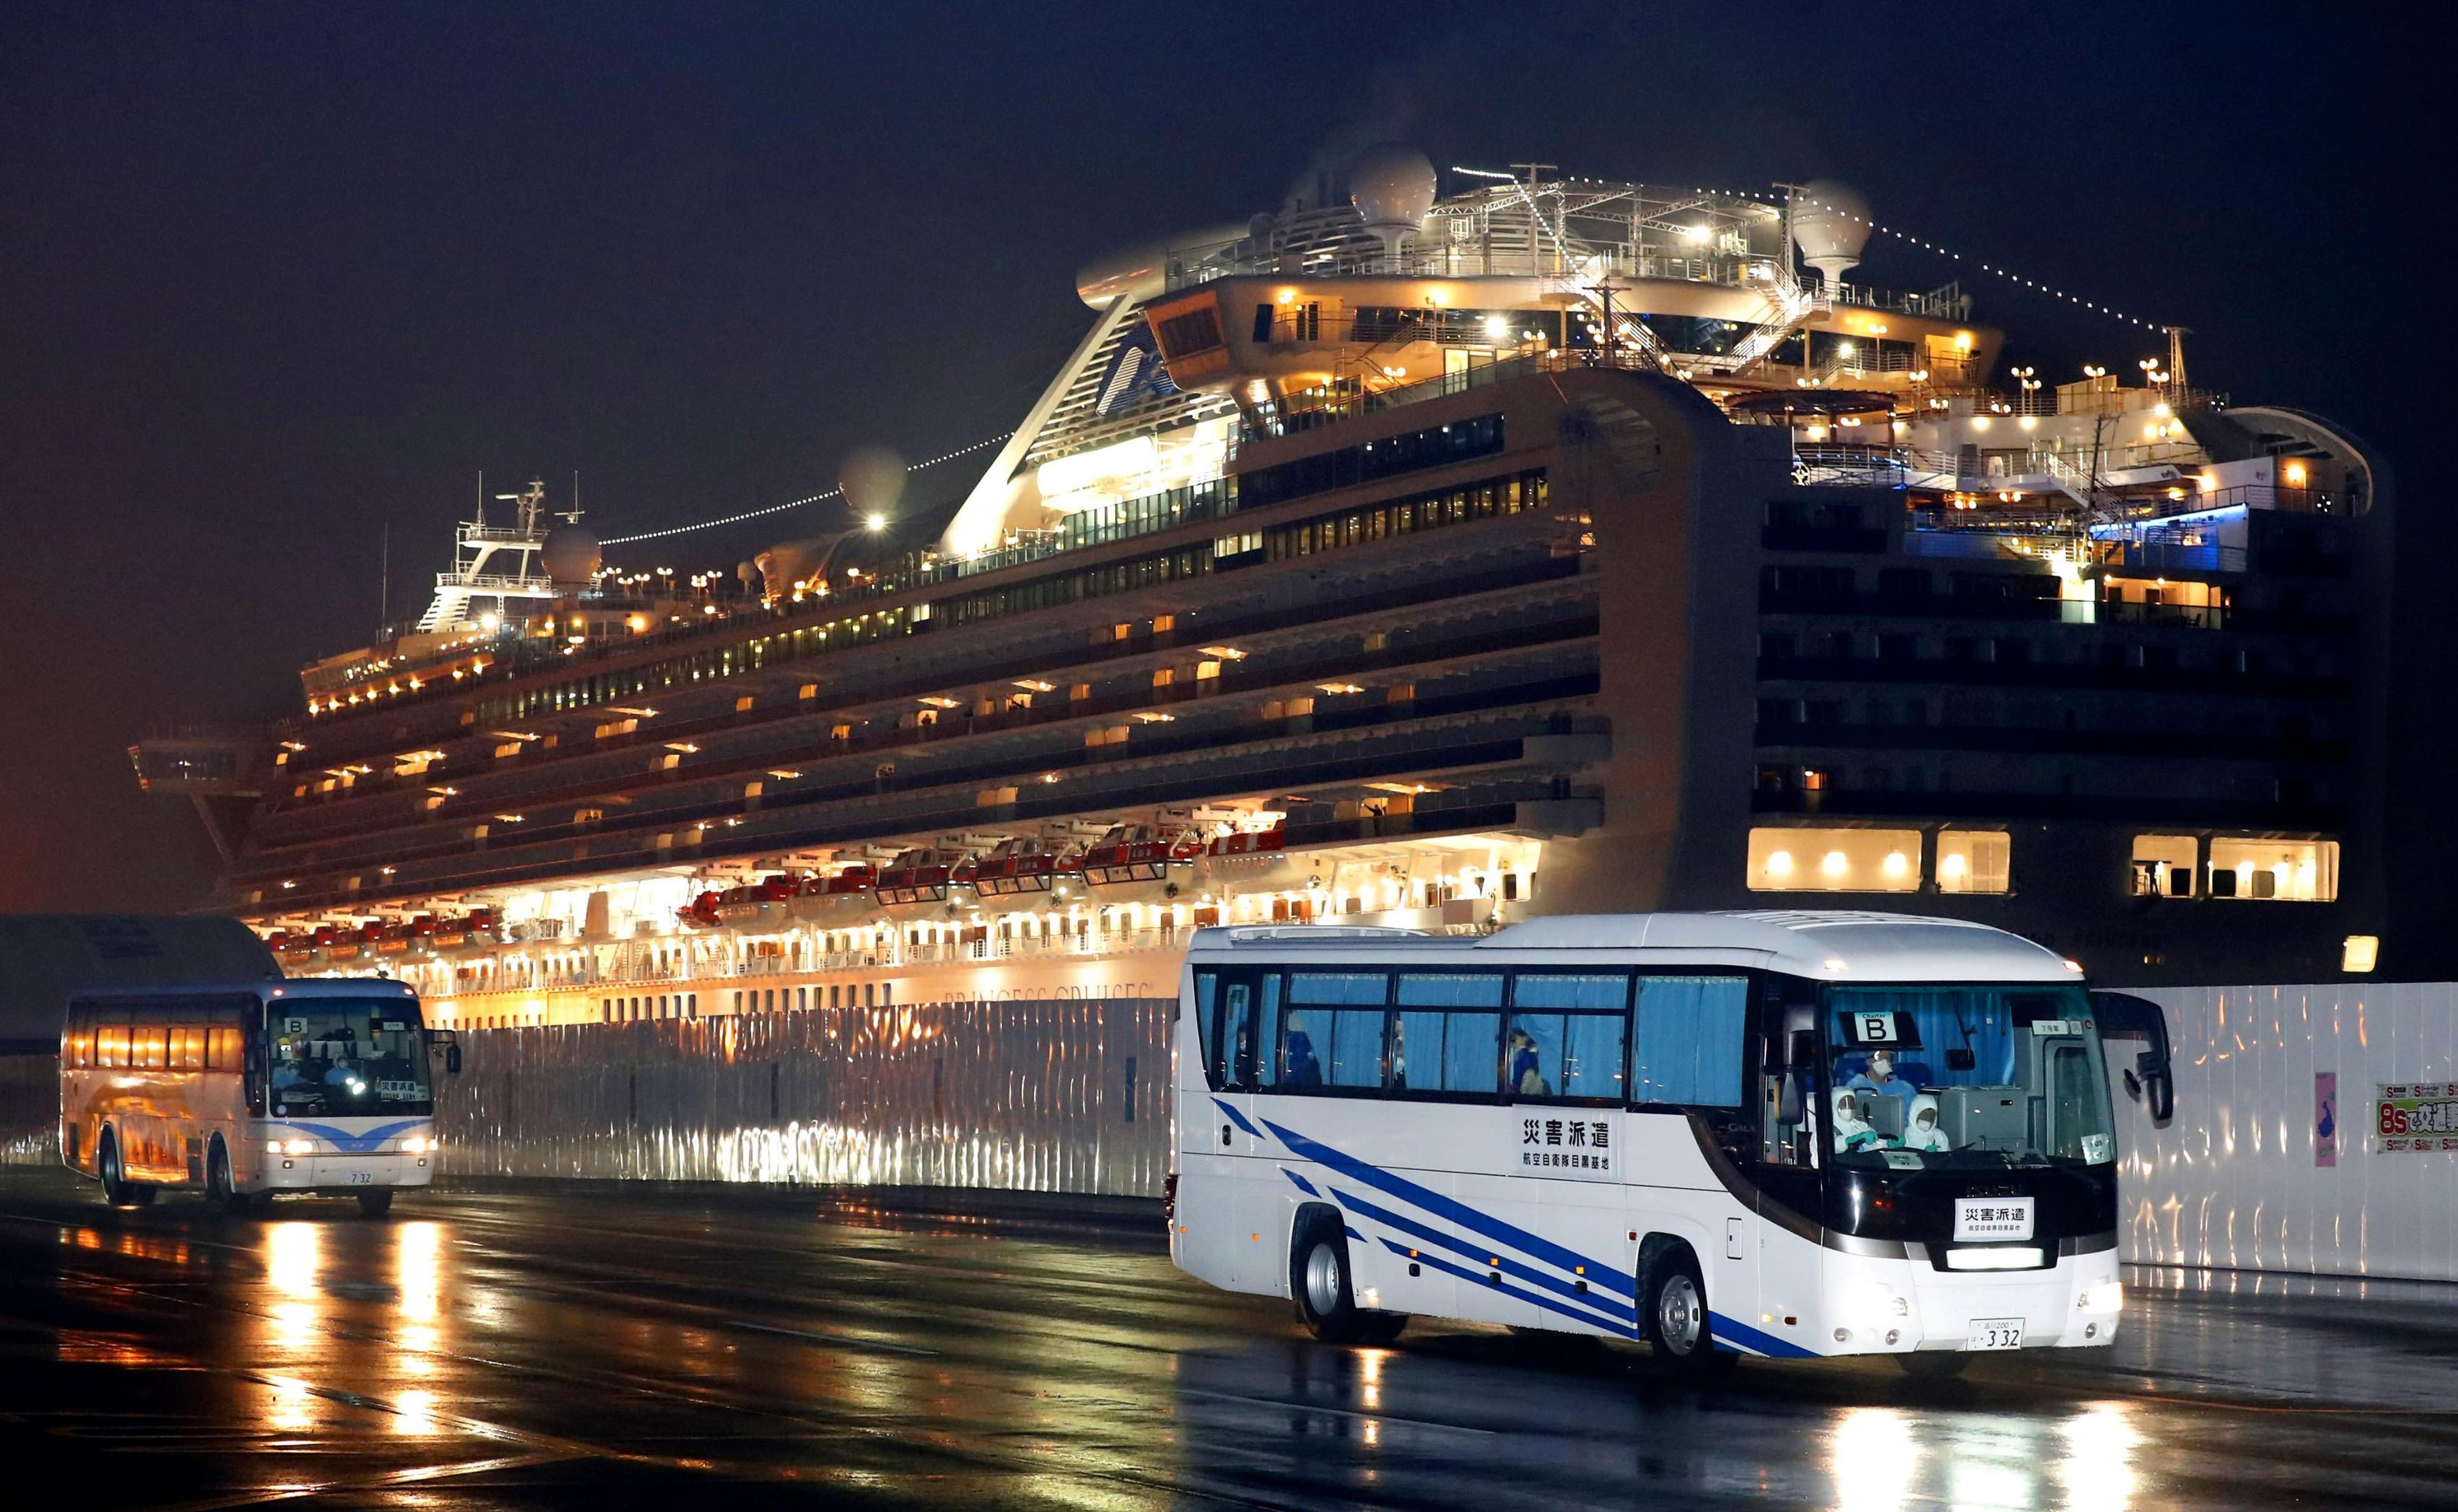 Coronavirus: Nearly 500 To Leave Quarantined Japan Ship On Wednesday